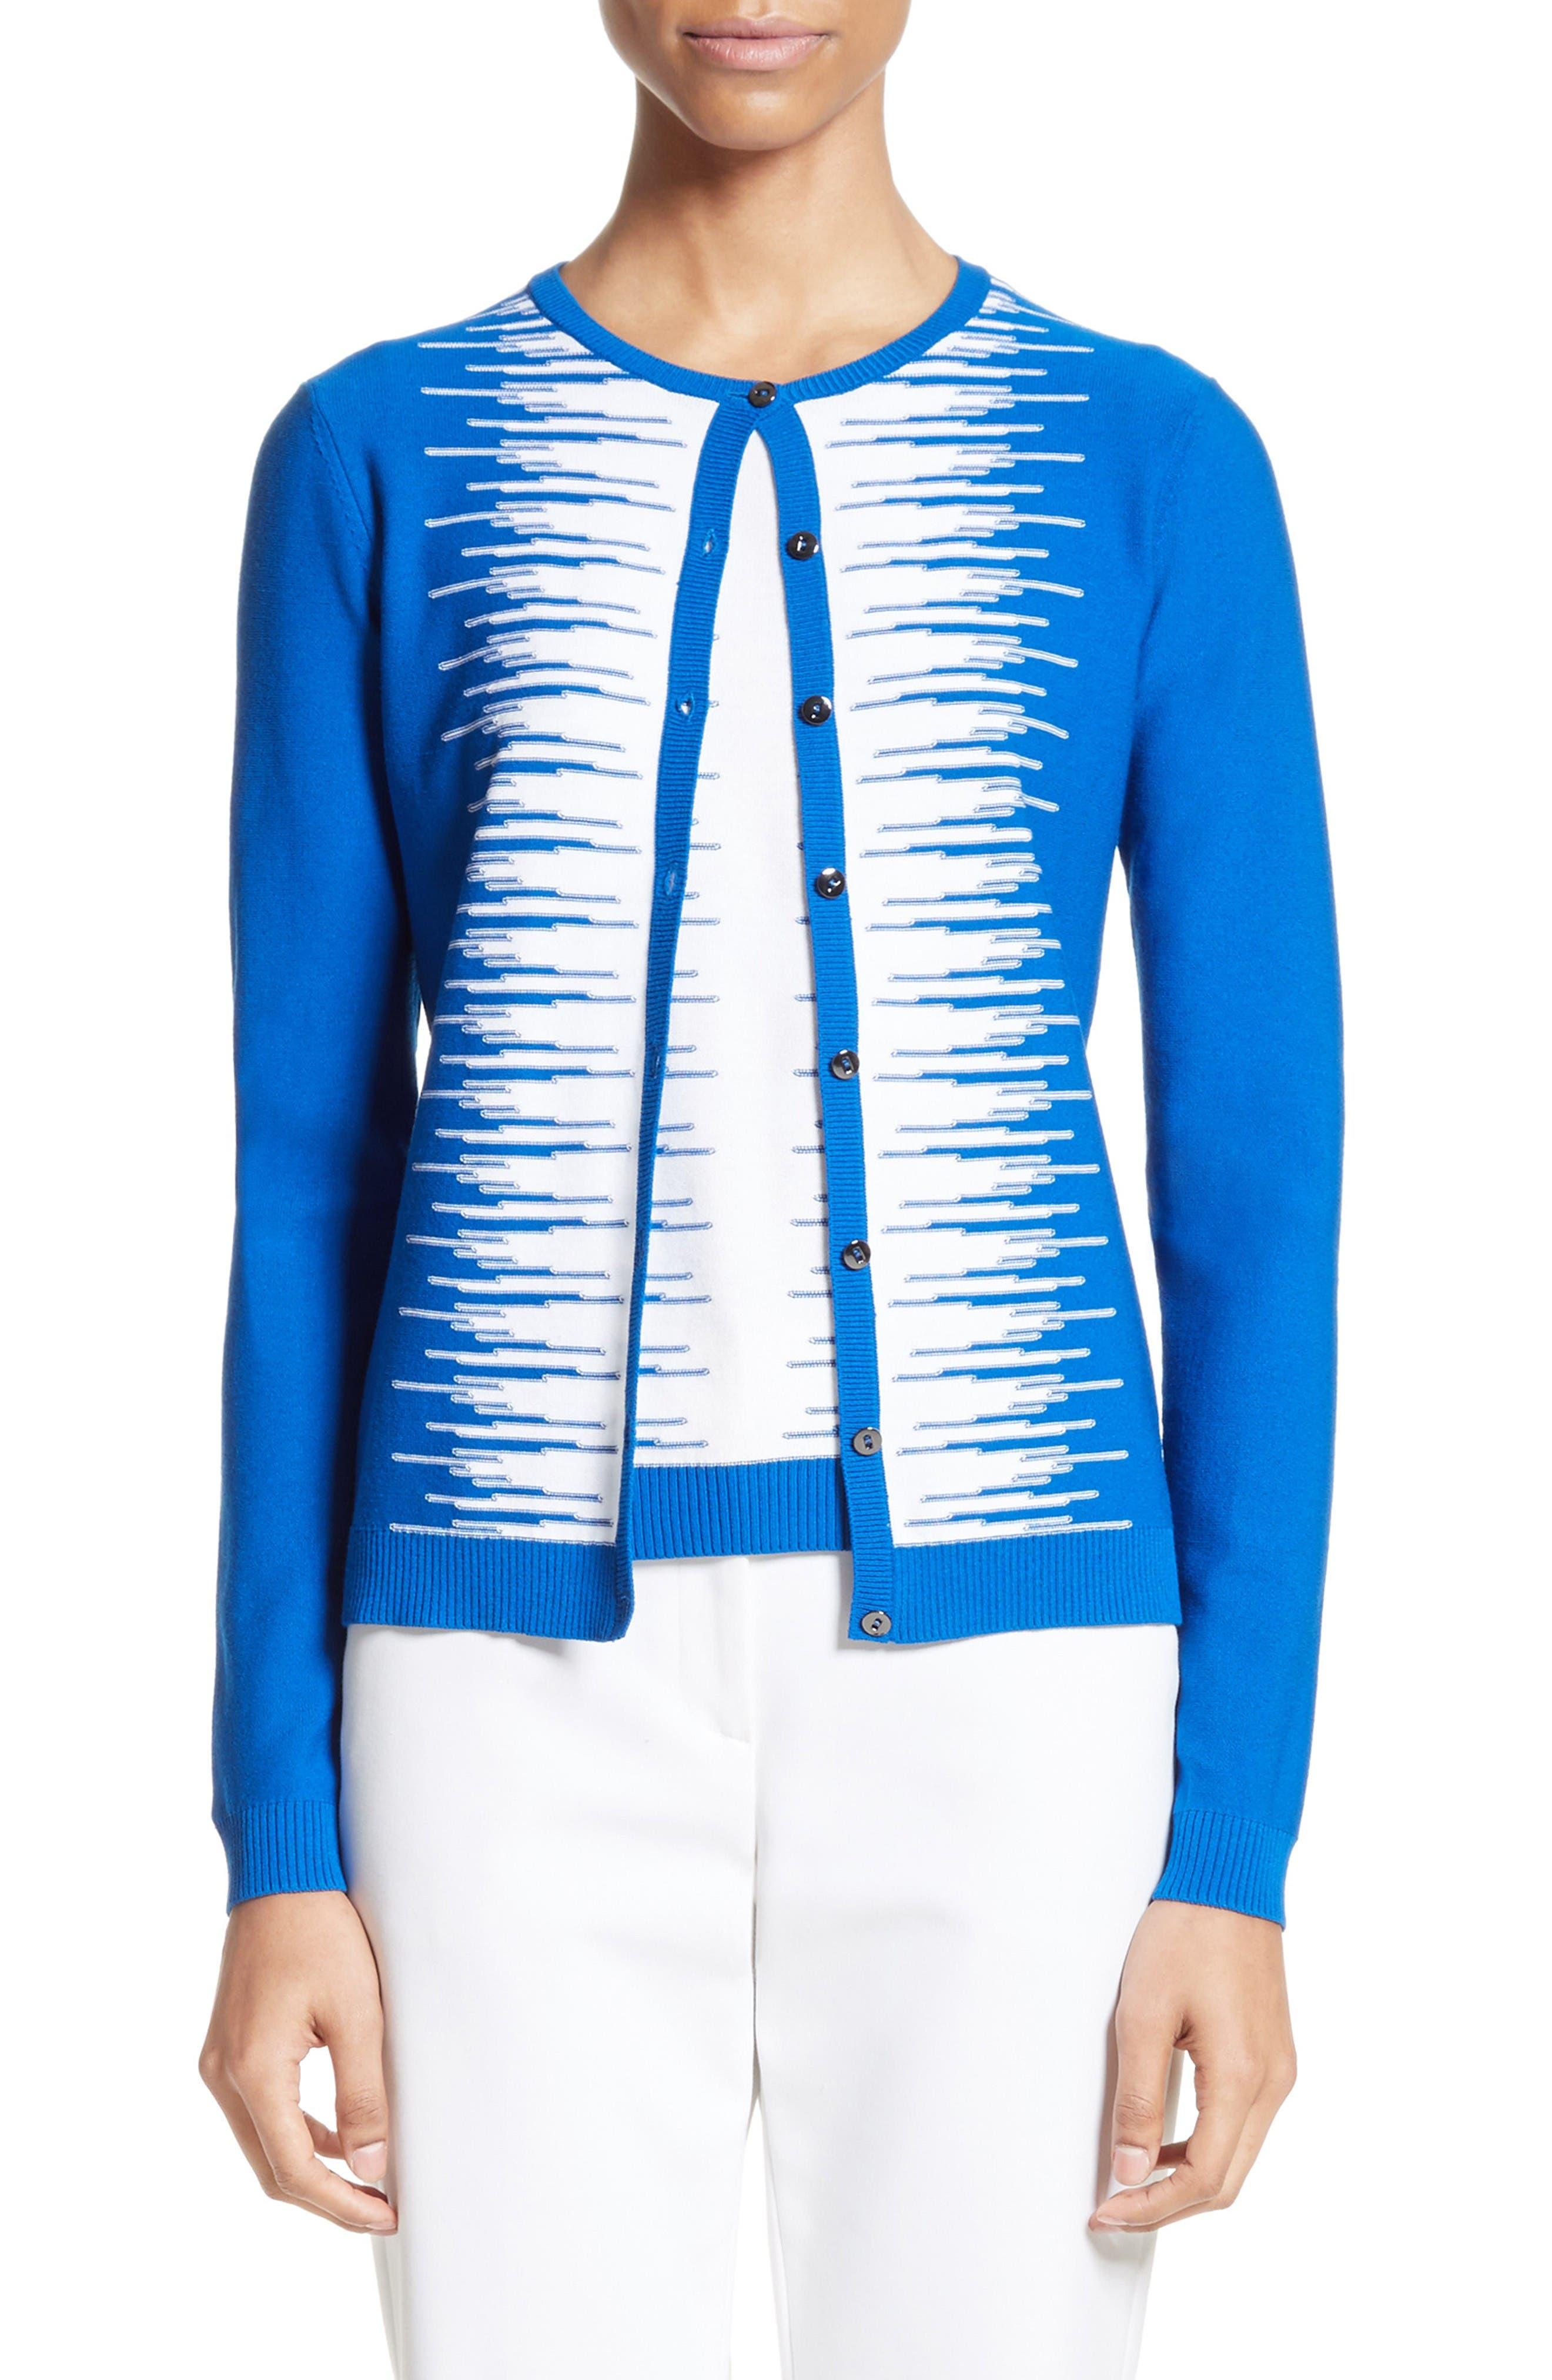 Stripe Intarsia Knit Cardigan,                             Main thumbnail 1, color,                             Jaya Blue/ Bianco